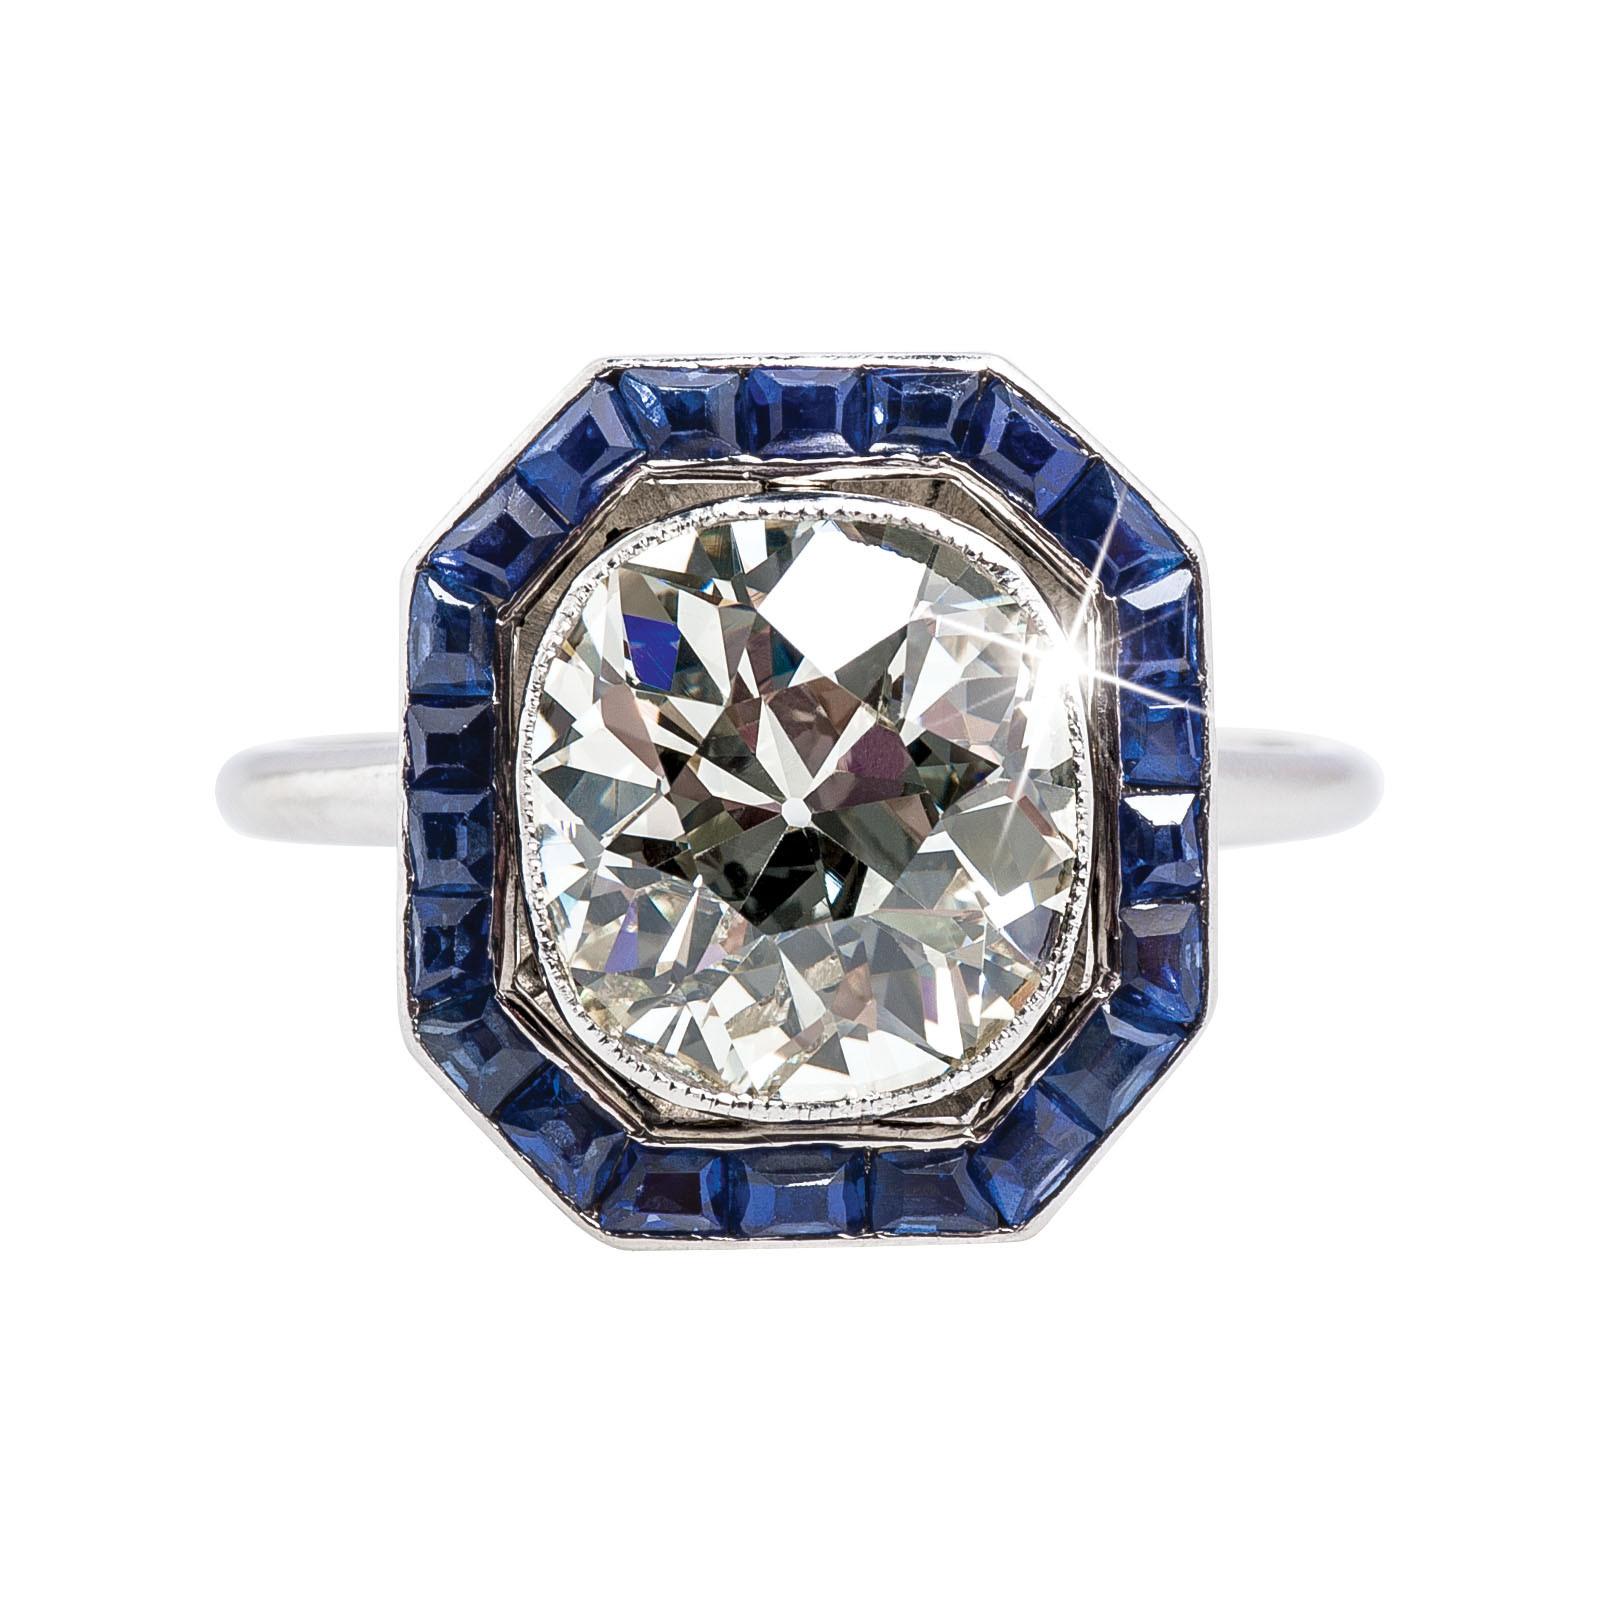 Vintage 3.66 CTW Diamond & Blue Sapphire Ring